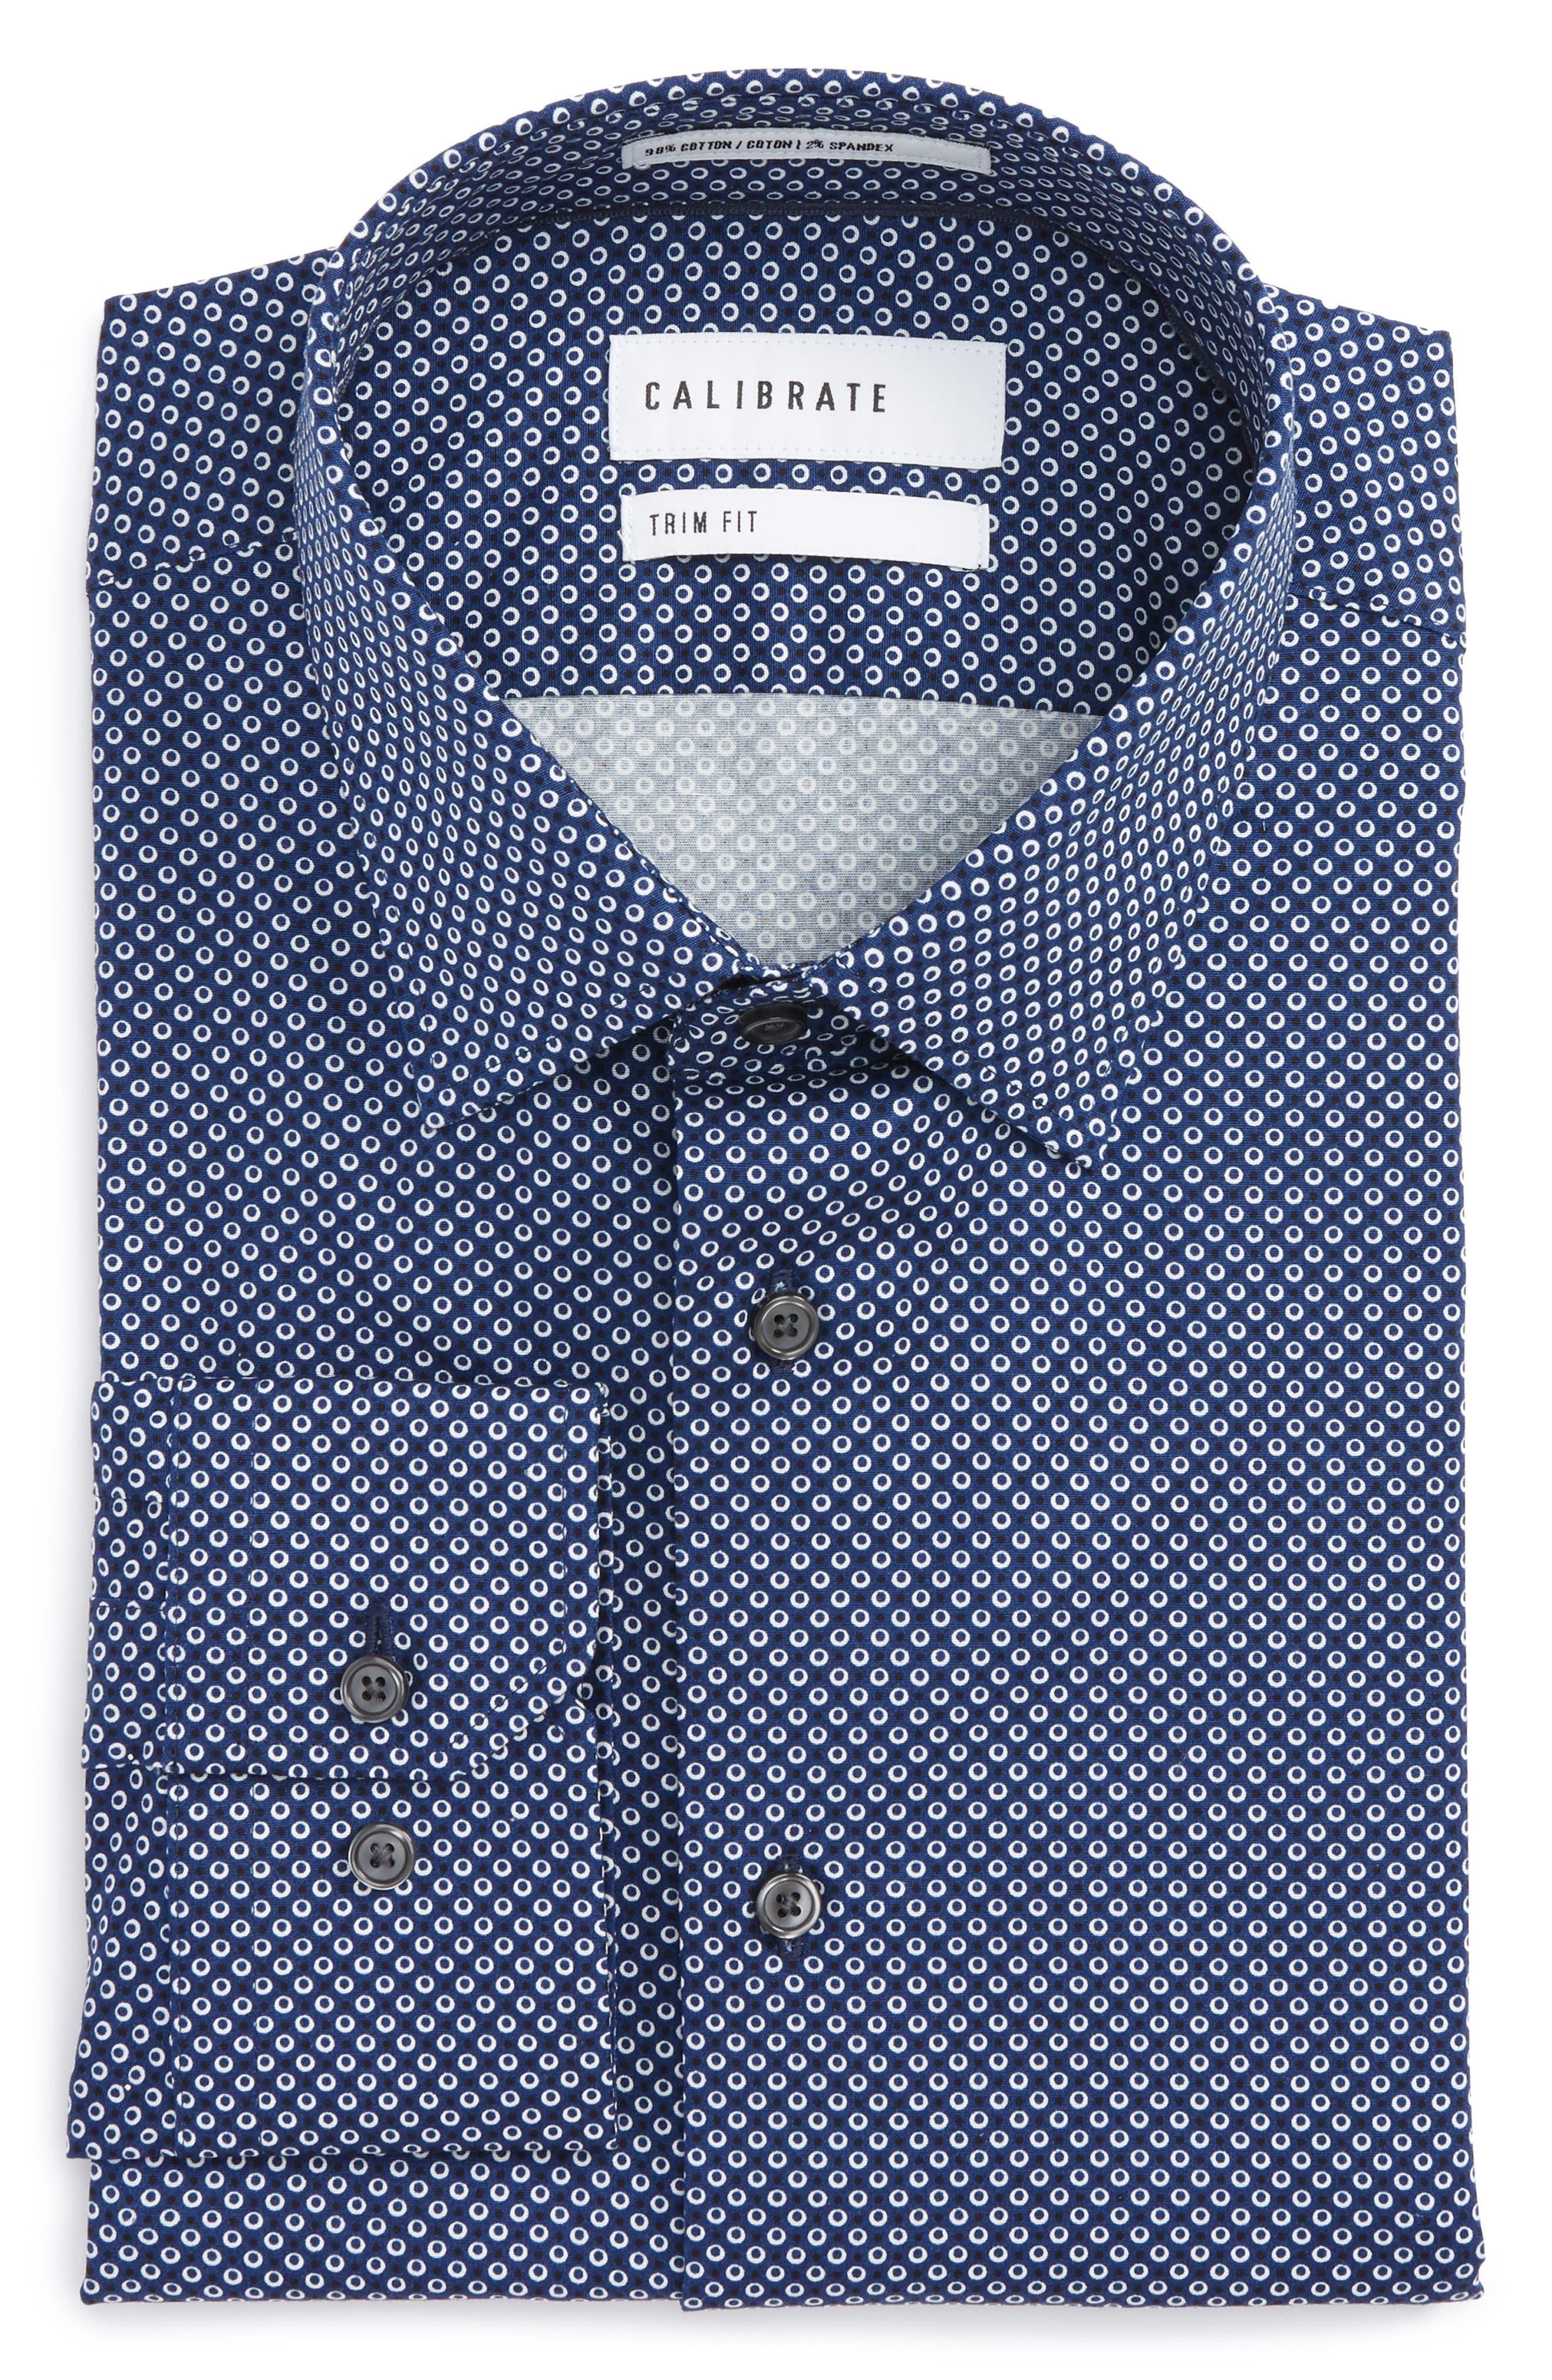 Main Image - Calibrate Trim Fit Dot Dress Shirt